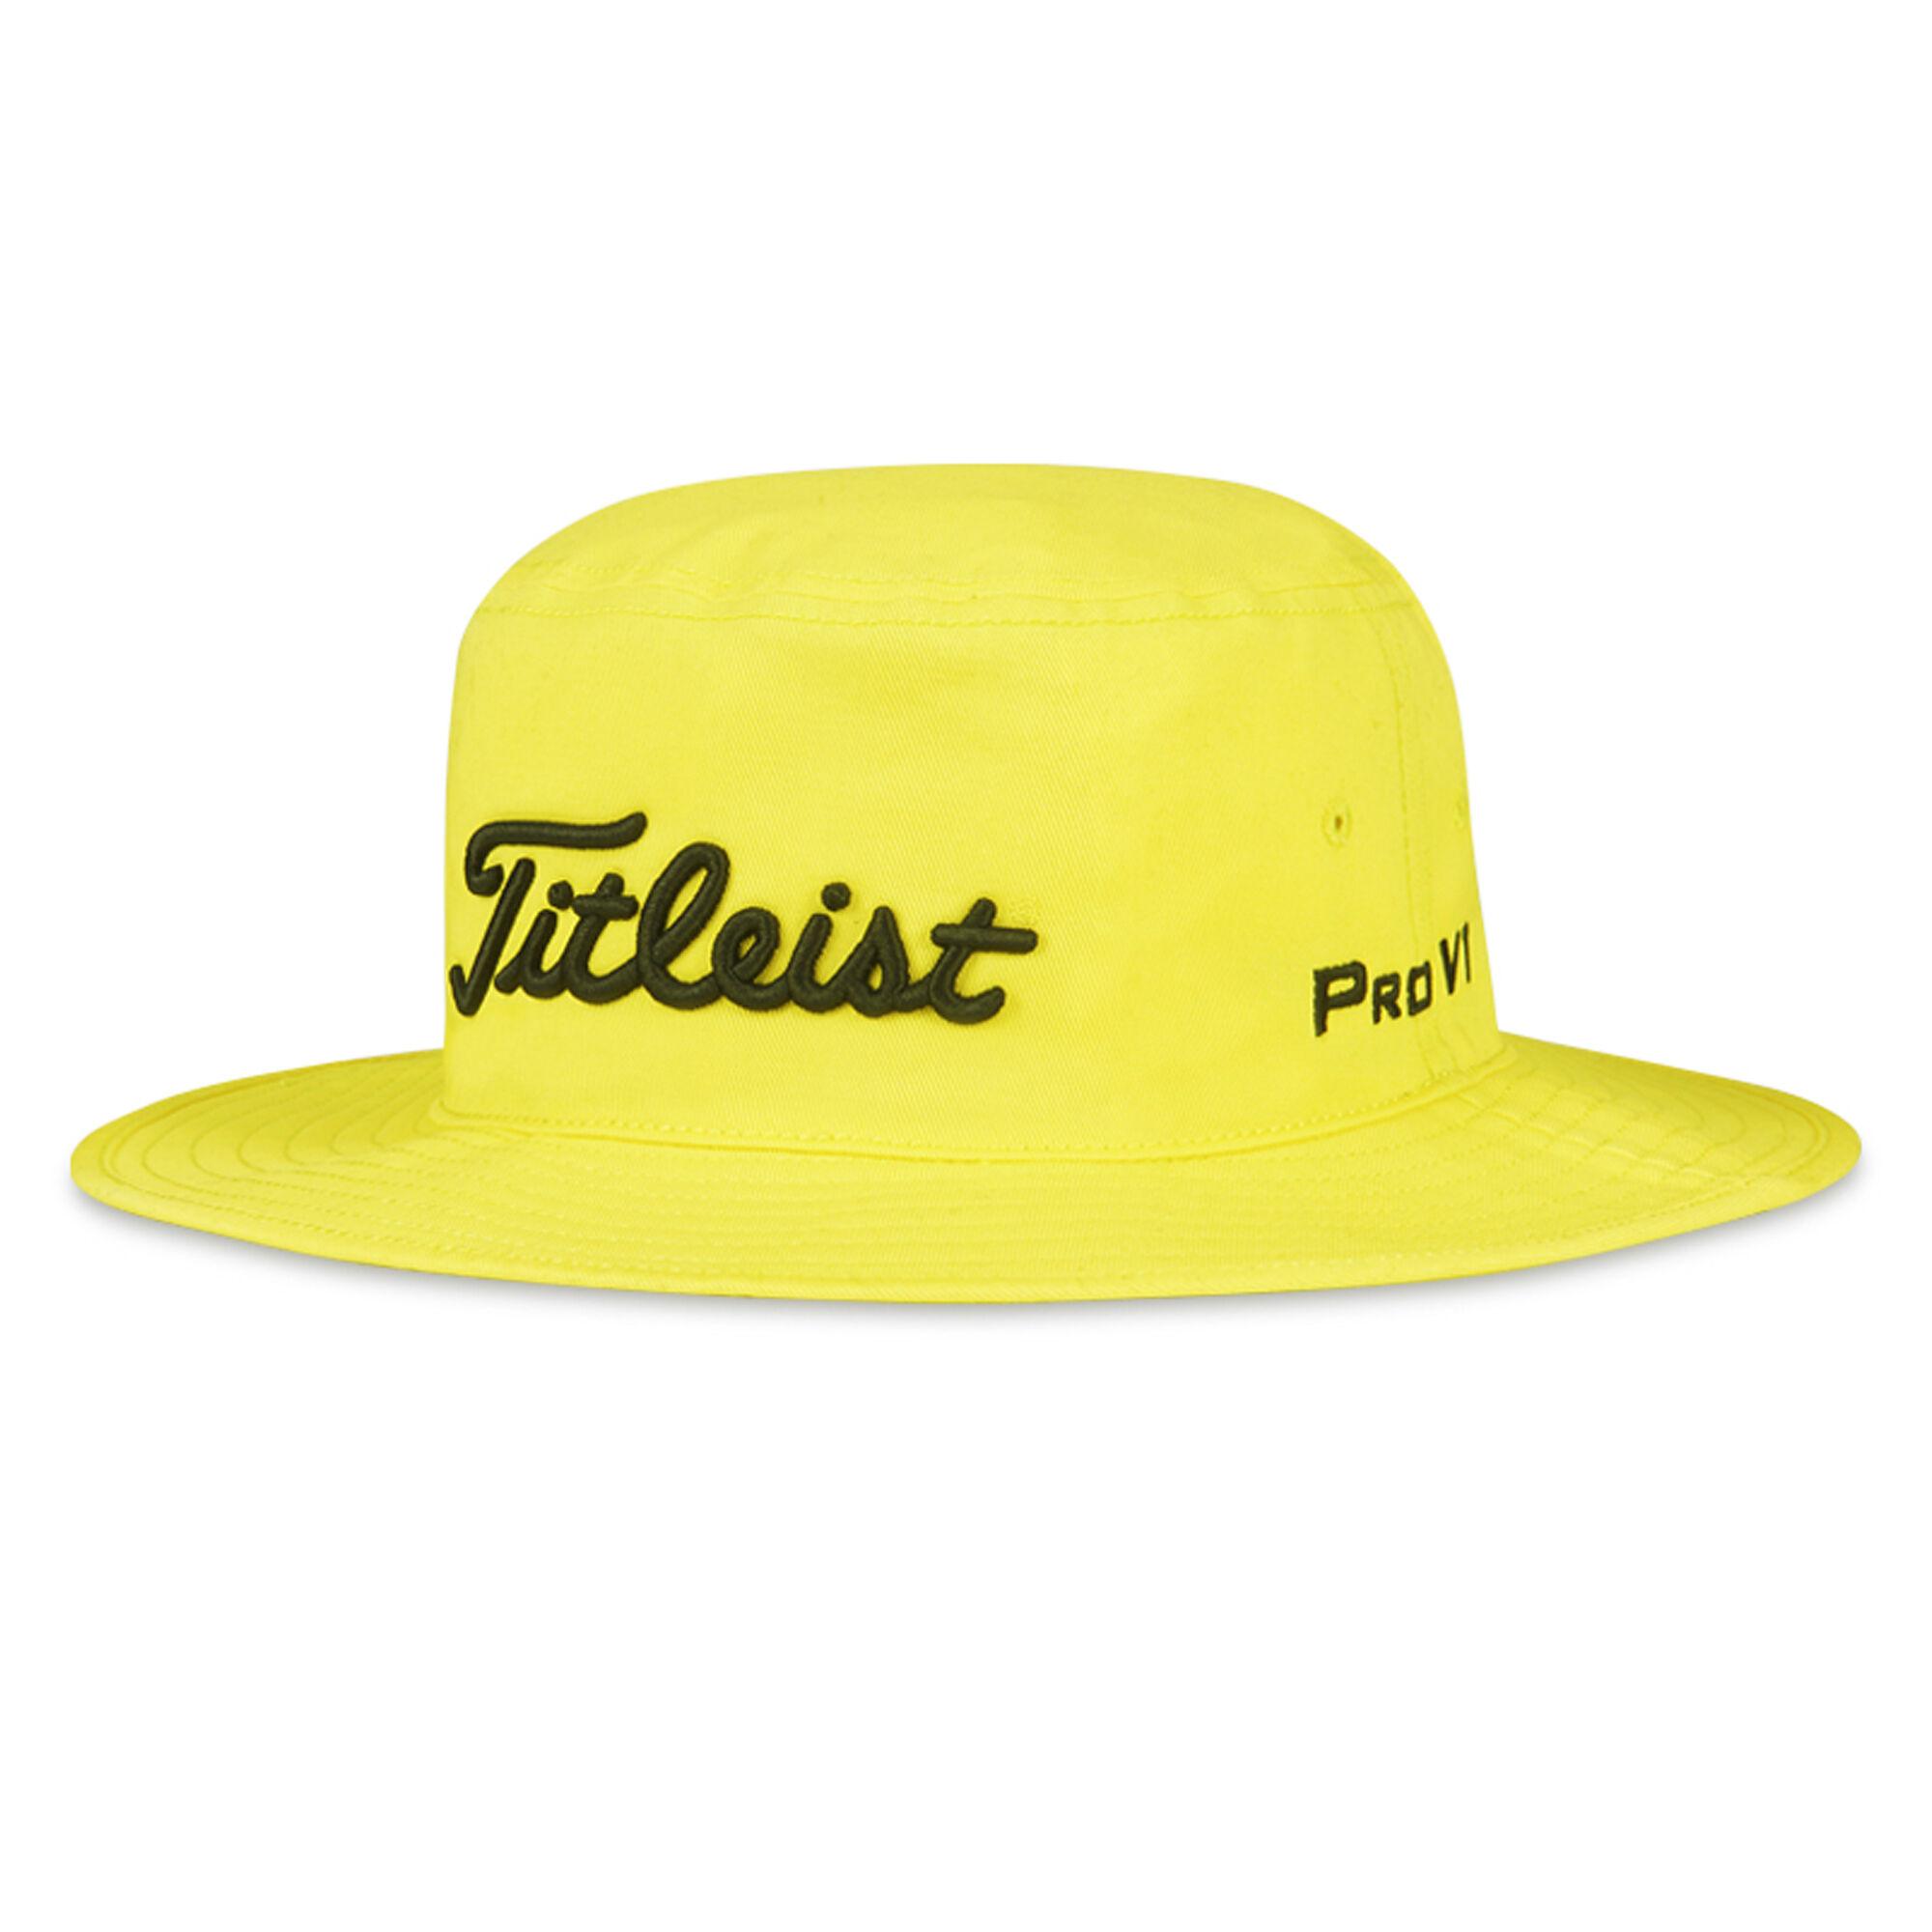 f07b7a45ff6 ... clearance shop jarrod lyle yellow titleist bucket hat titleist 522f0  10166 ...